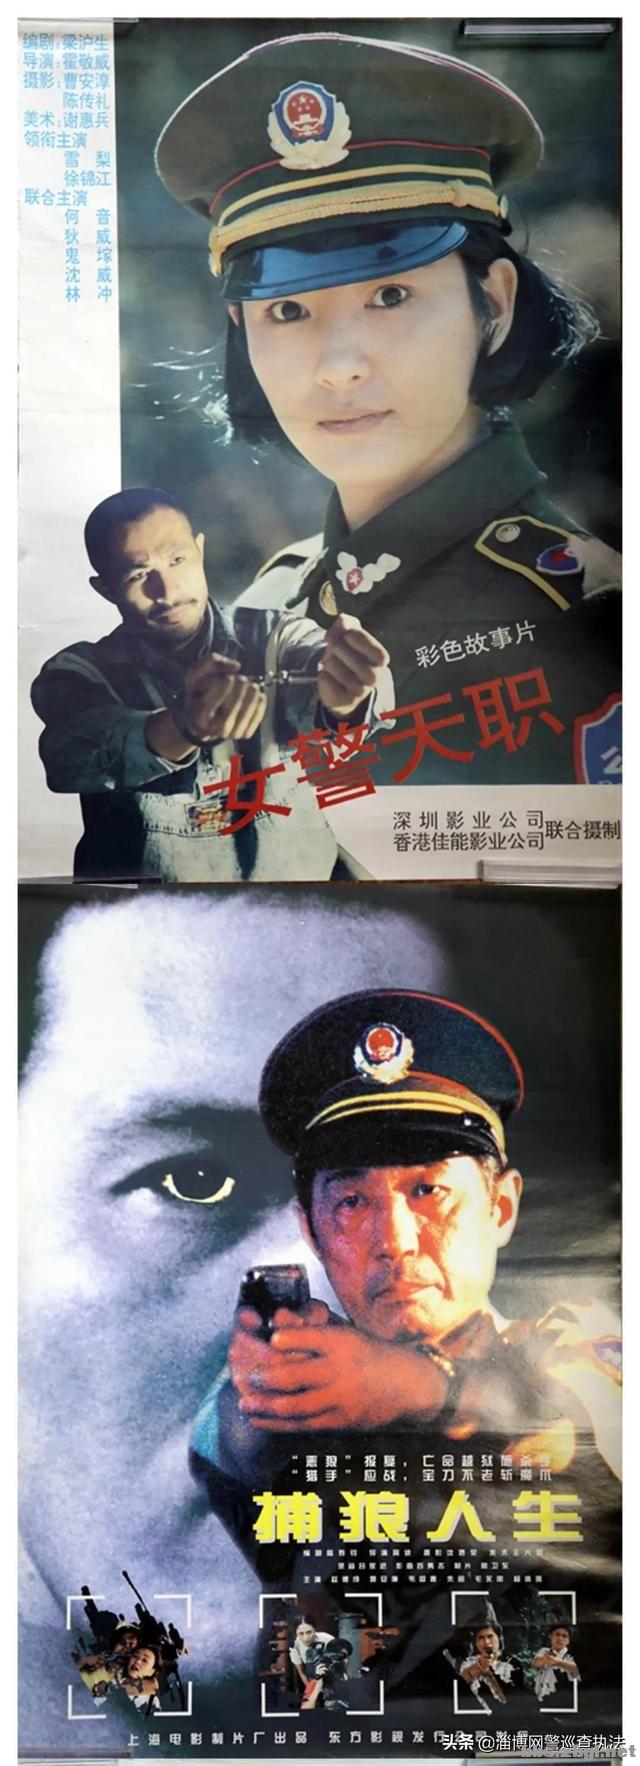 YYDS!这些电影里的警察陪伴了多少人的青春......-13.jpg